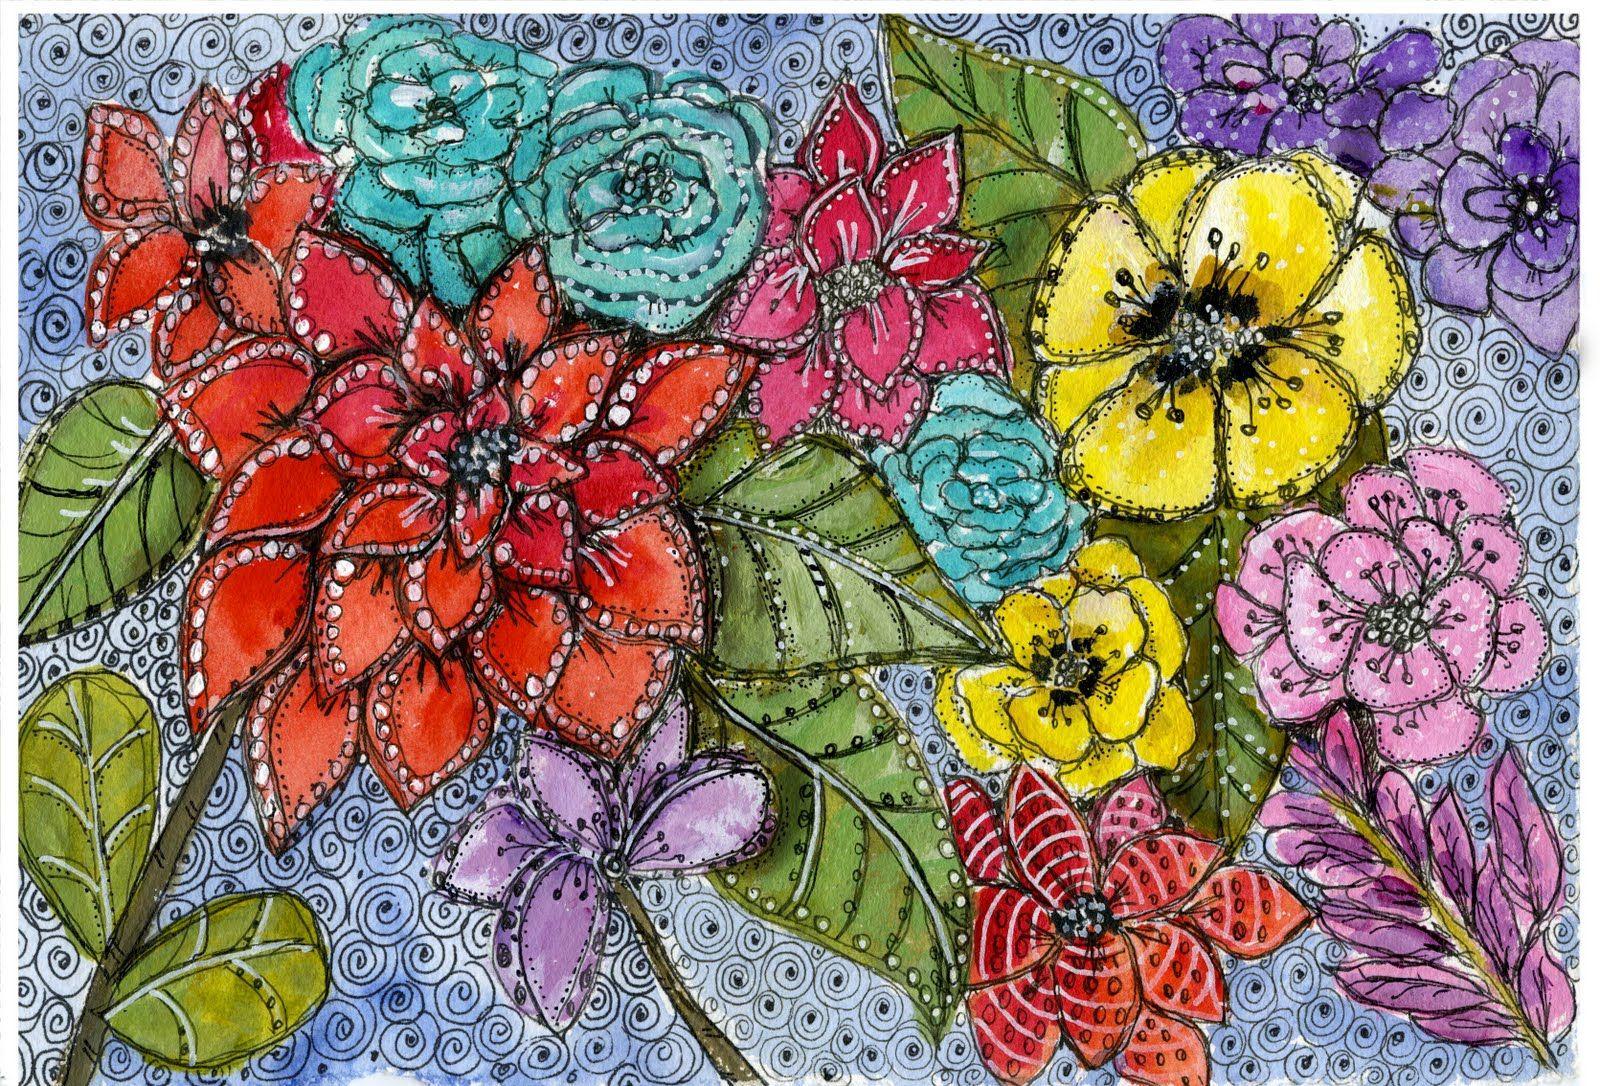 Art du Jour by Martha Lever: Doodle Flowers in Greenville | Doodles ...